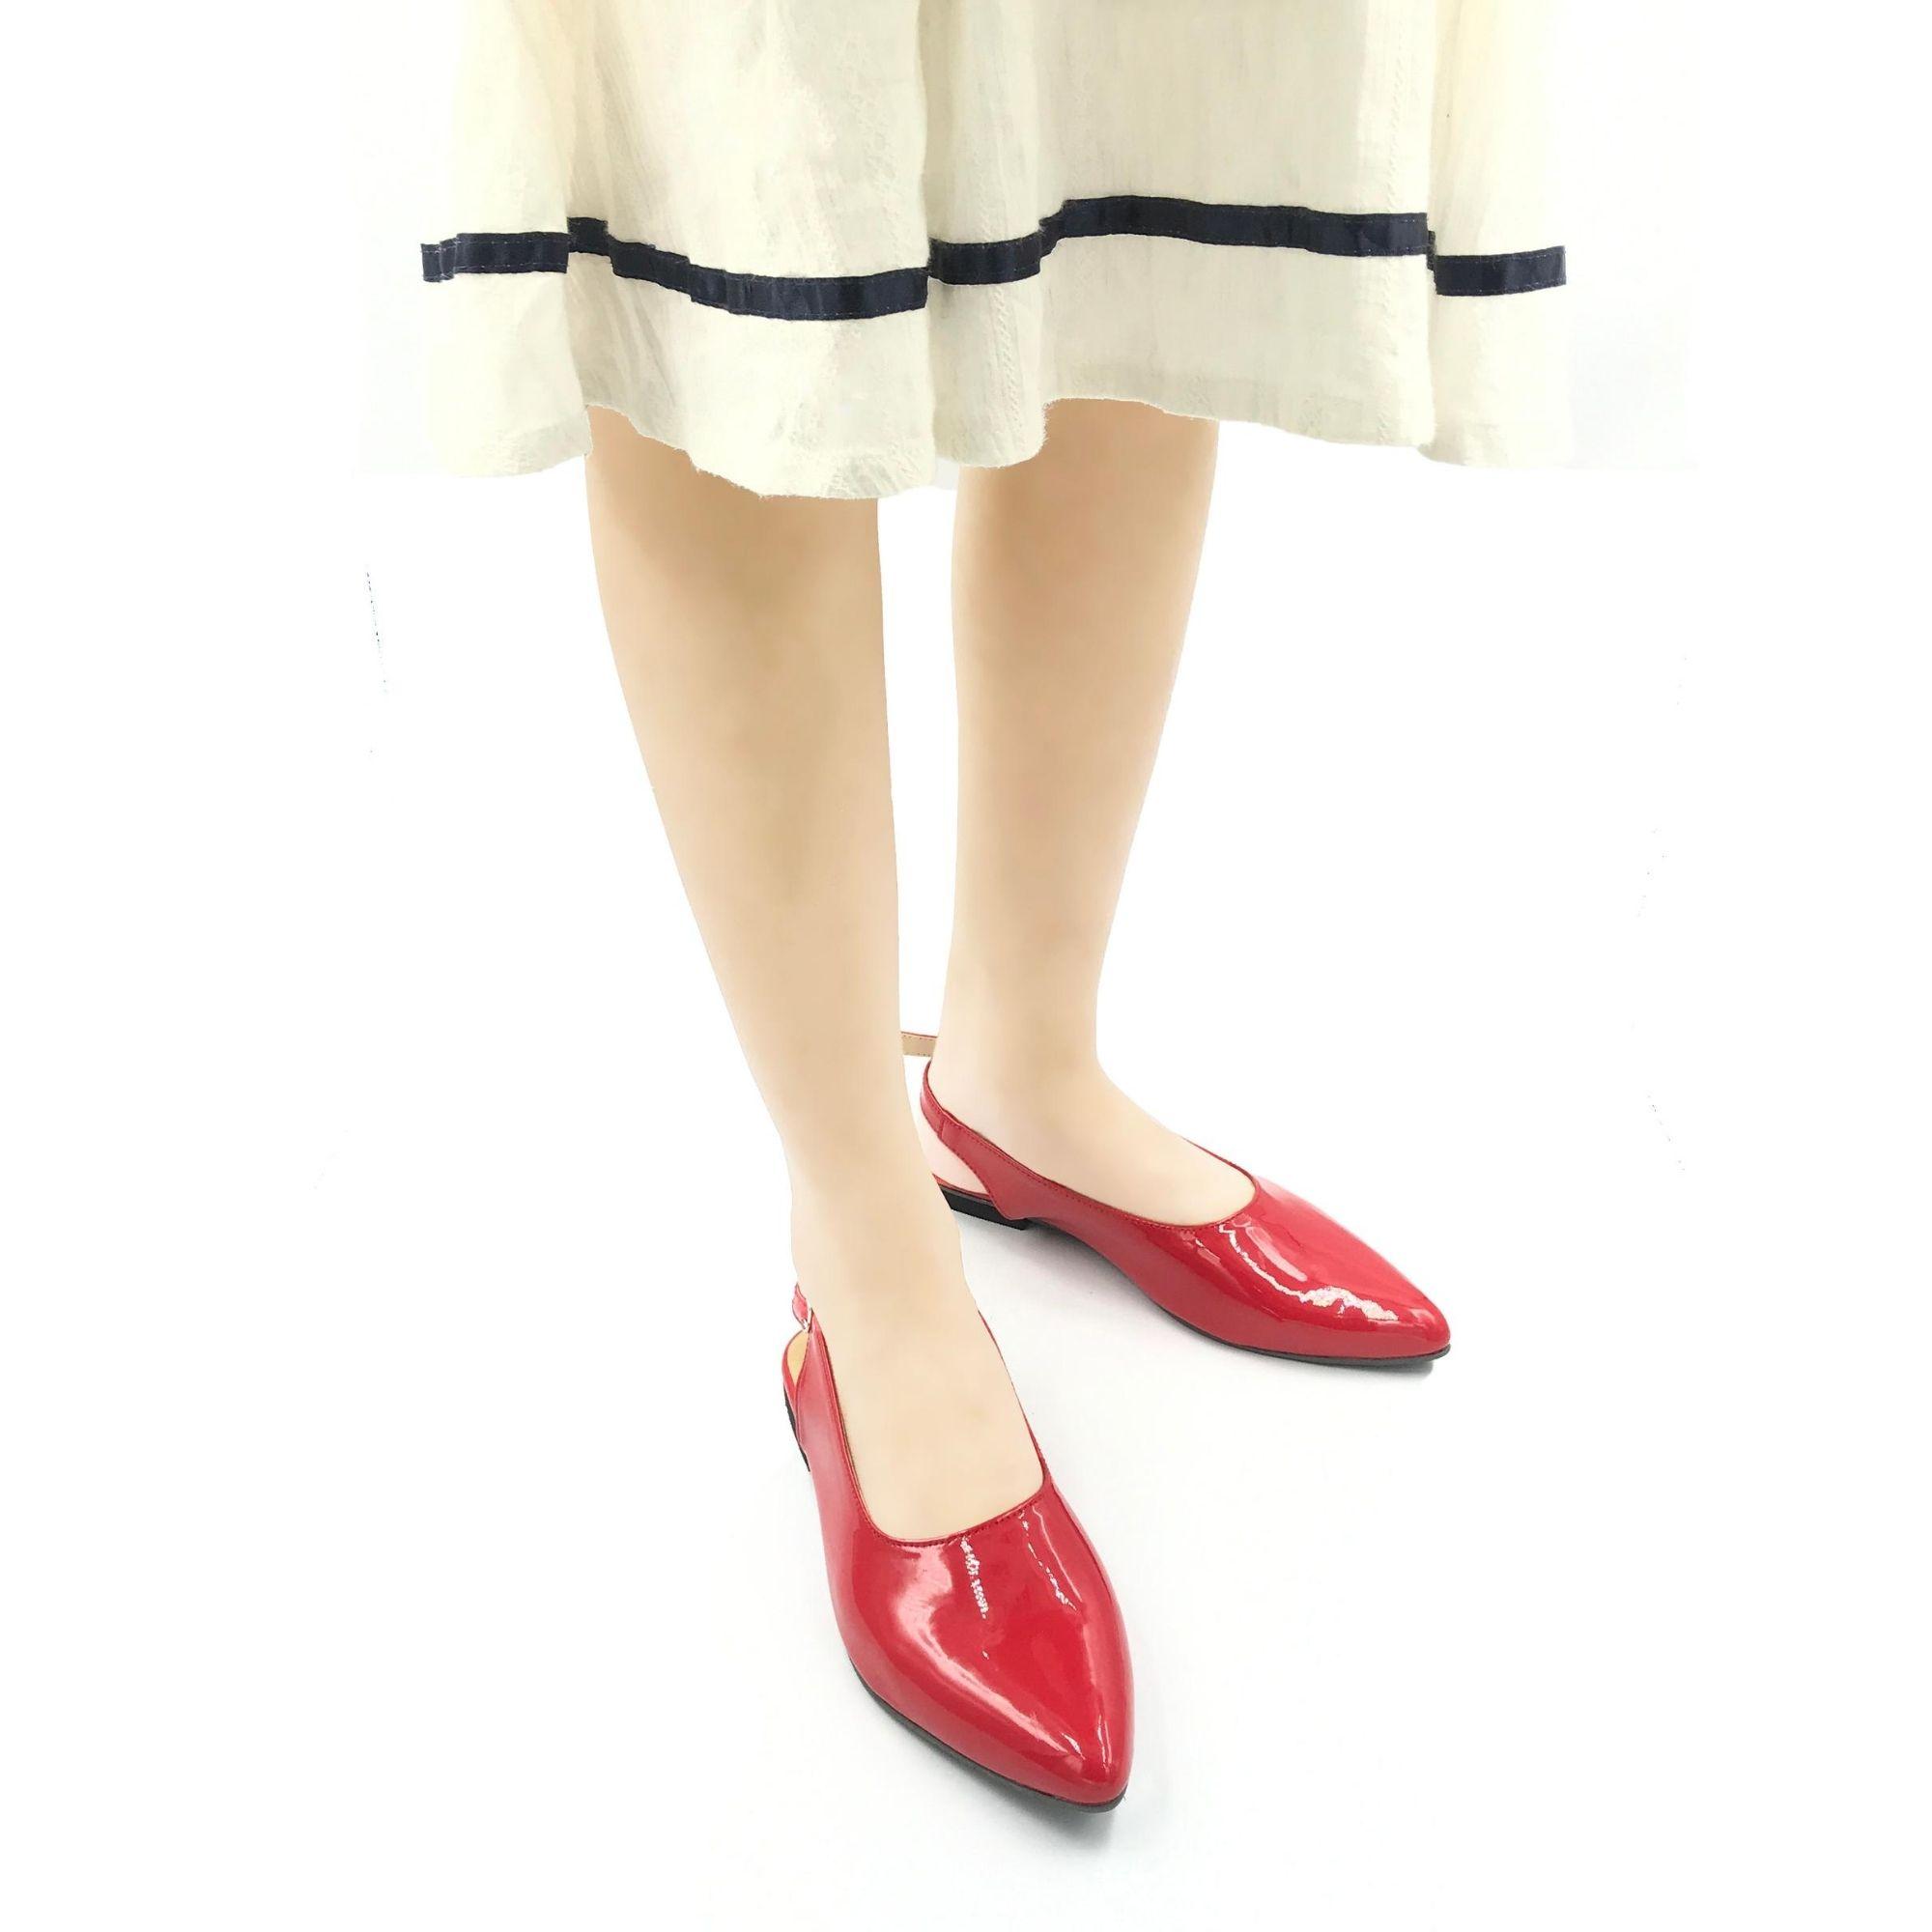 Premium Materials Used, Comfy Shoes